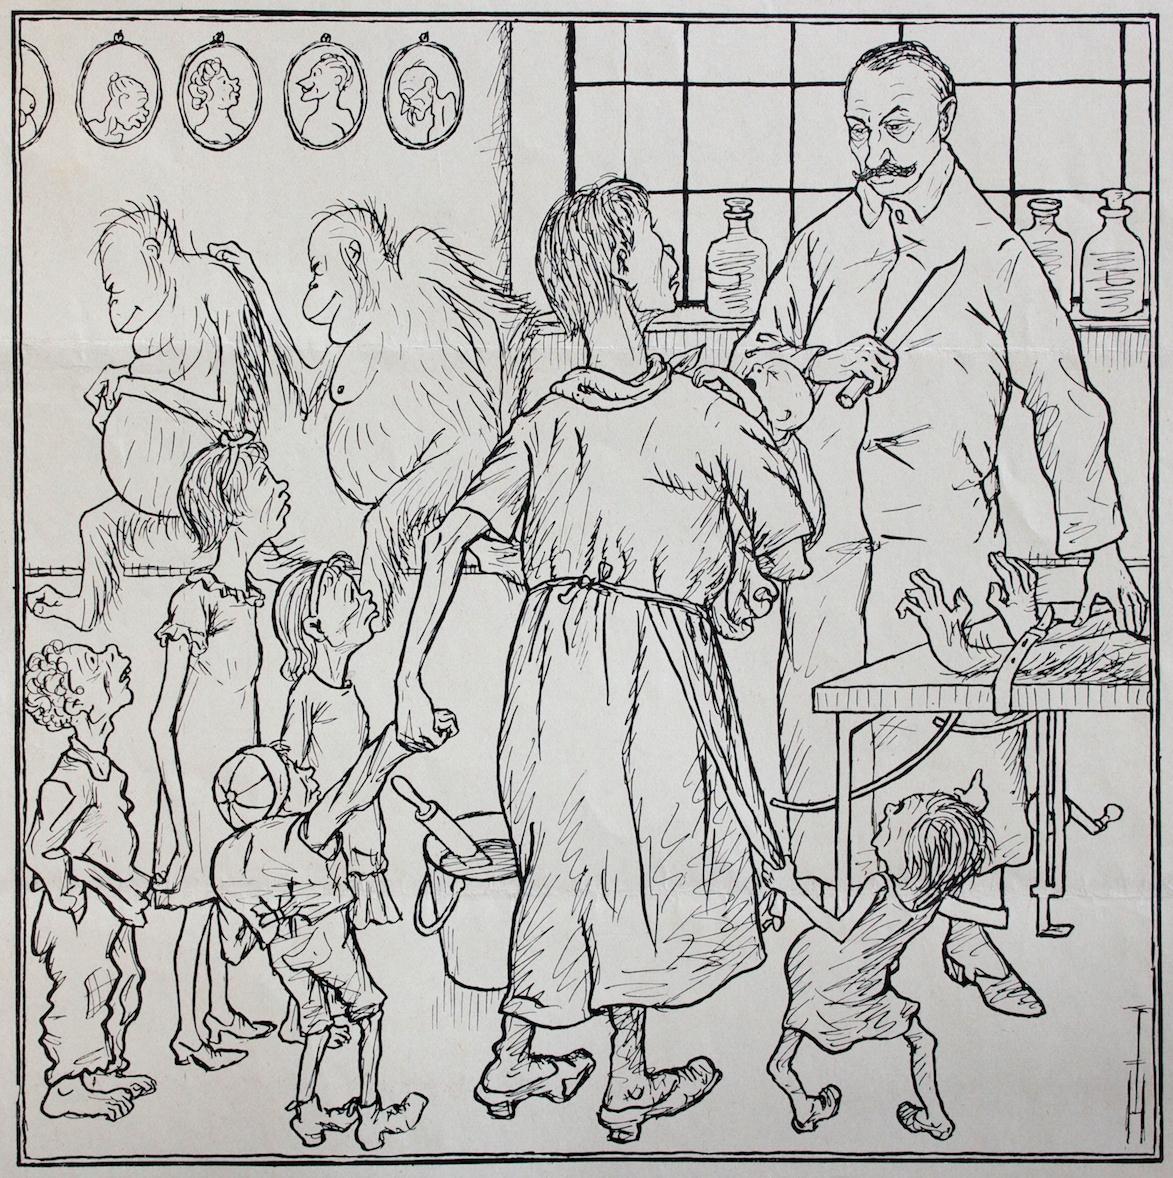 Thomas Theodor Heine - Bei Professor Voronoff (With Professor Voronoff) - Lithograph on paper - 1926